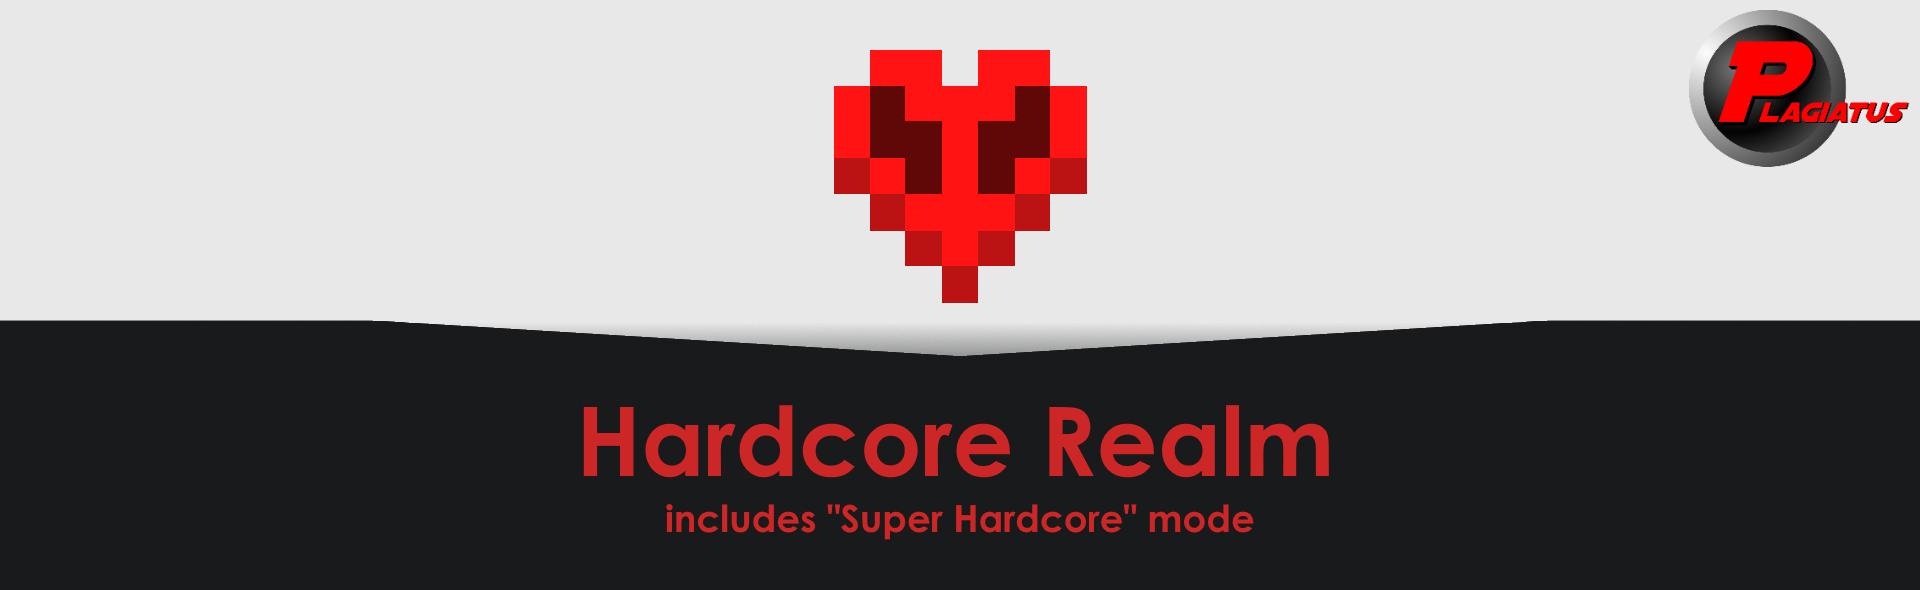 Hardcore Realm Banner